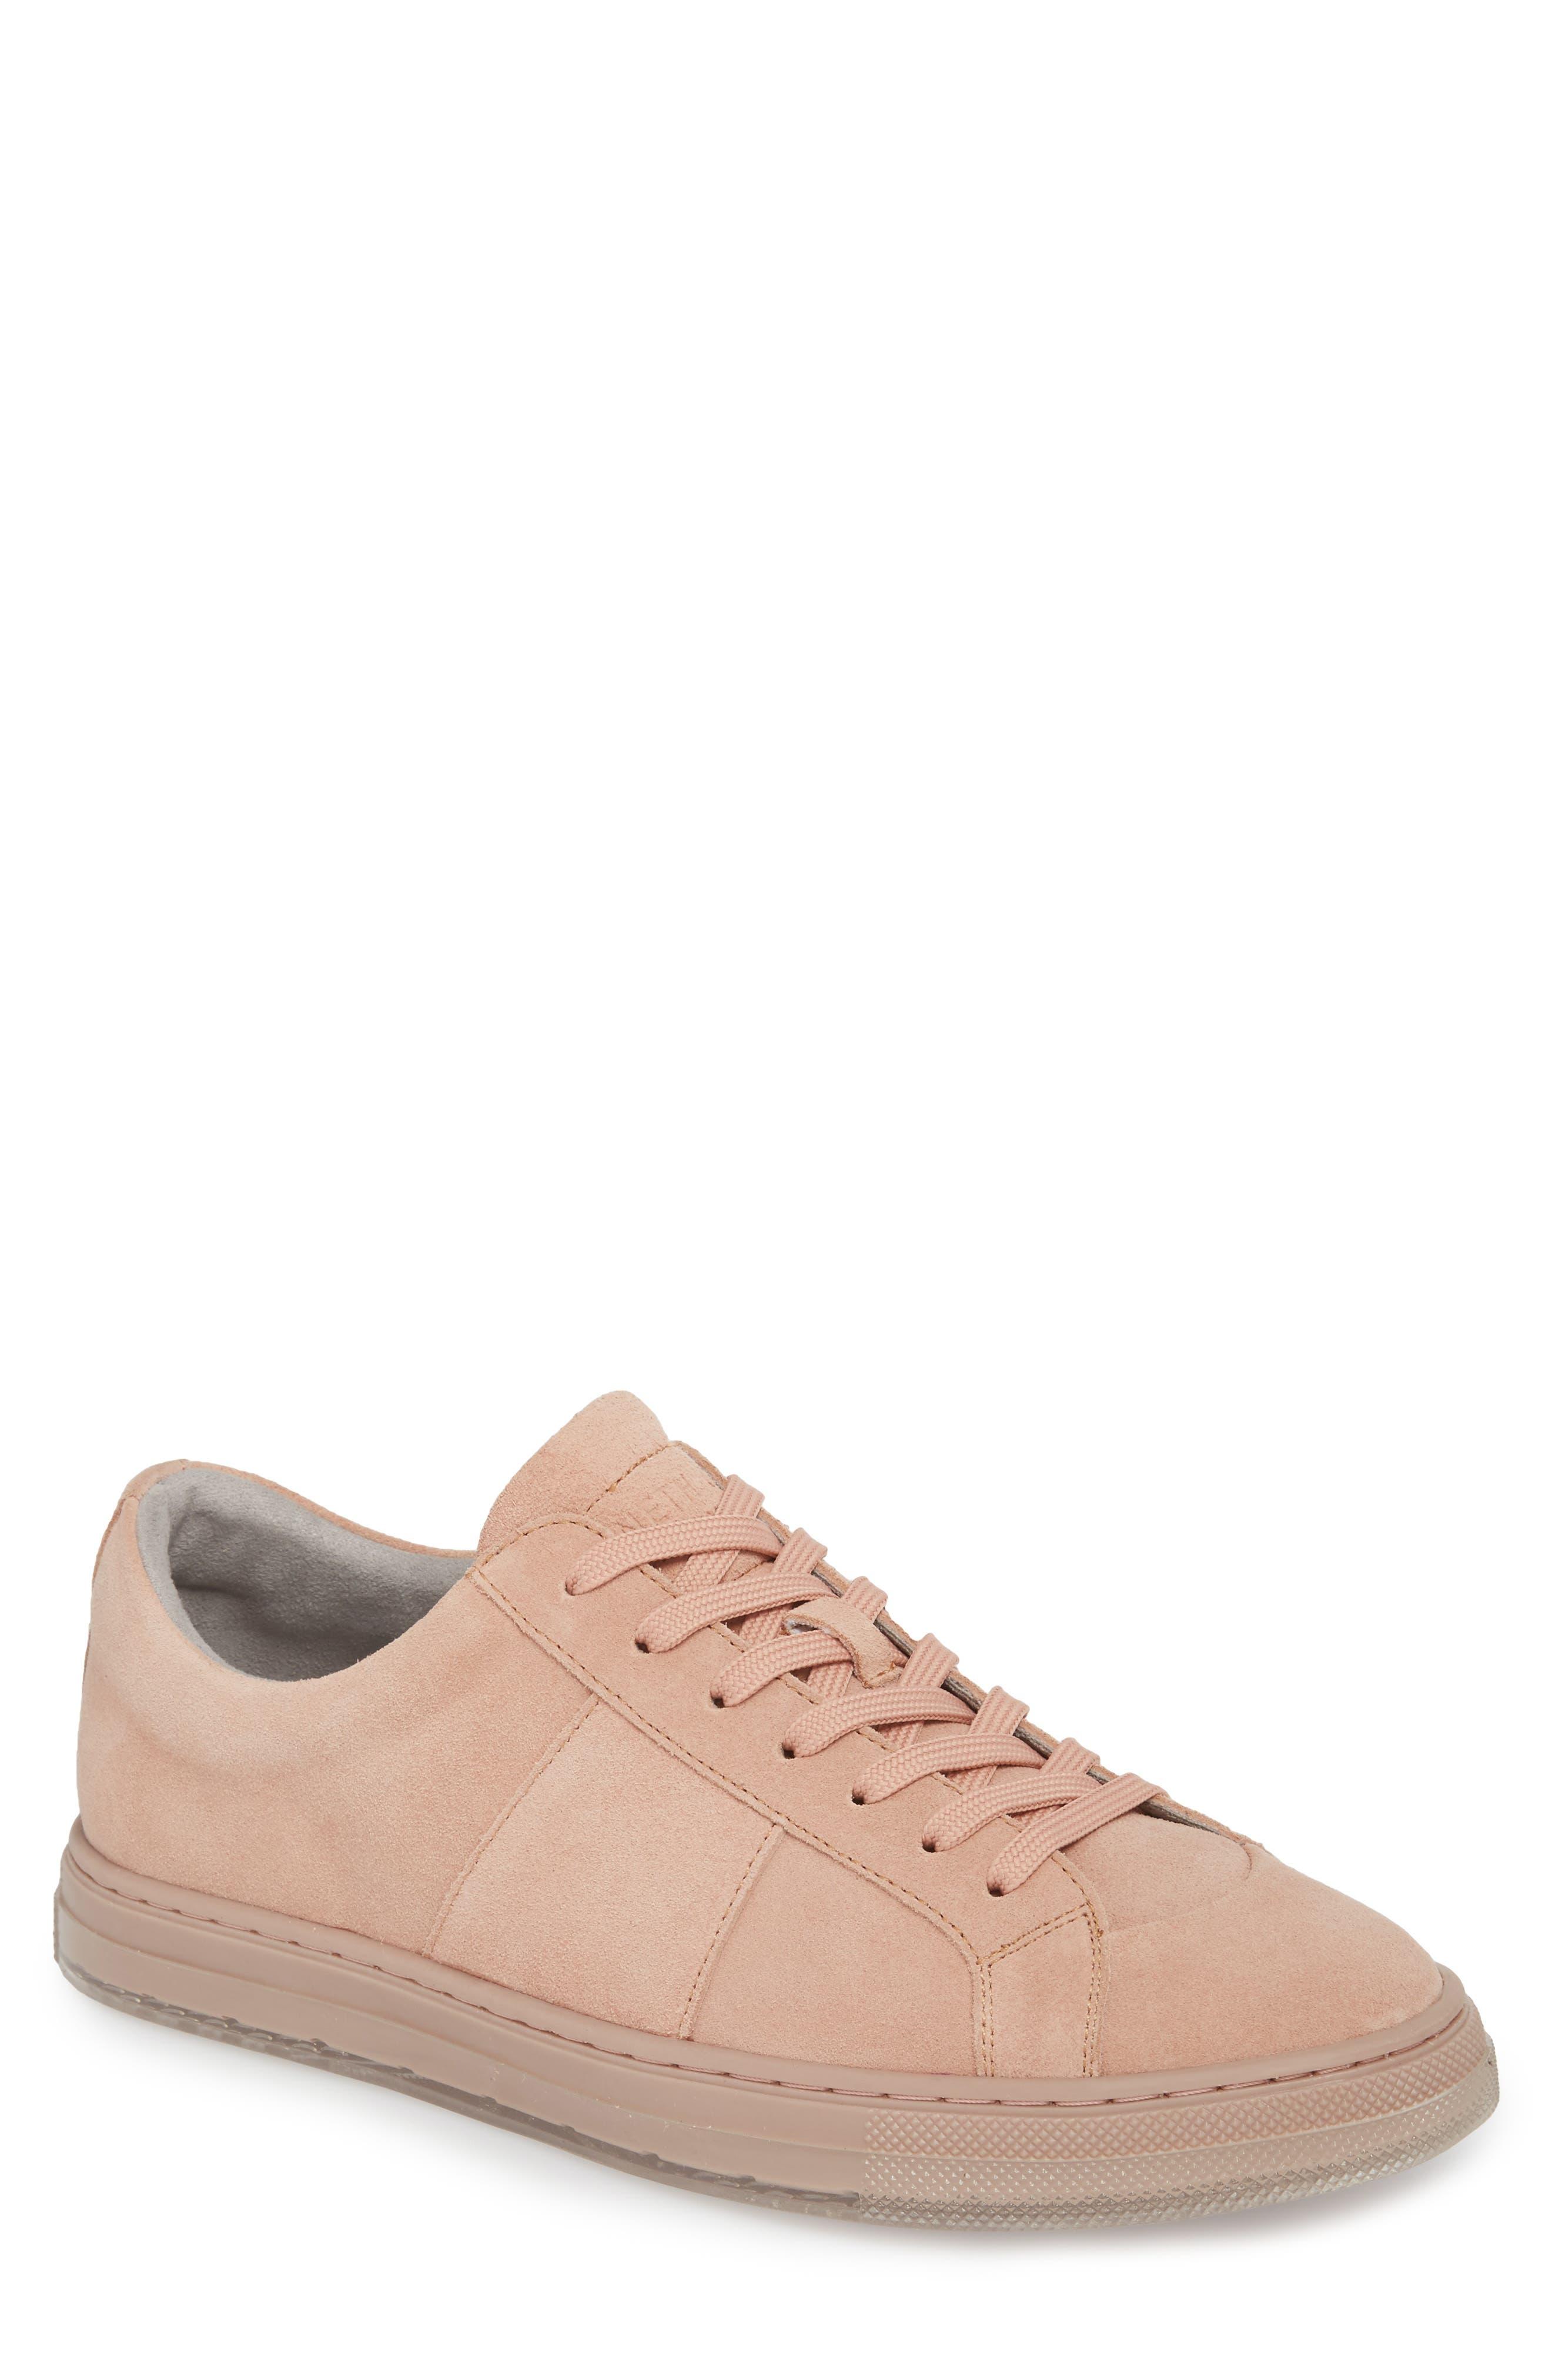 Colvin Sneaker,                         Main,                         color, Rose Suede